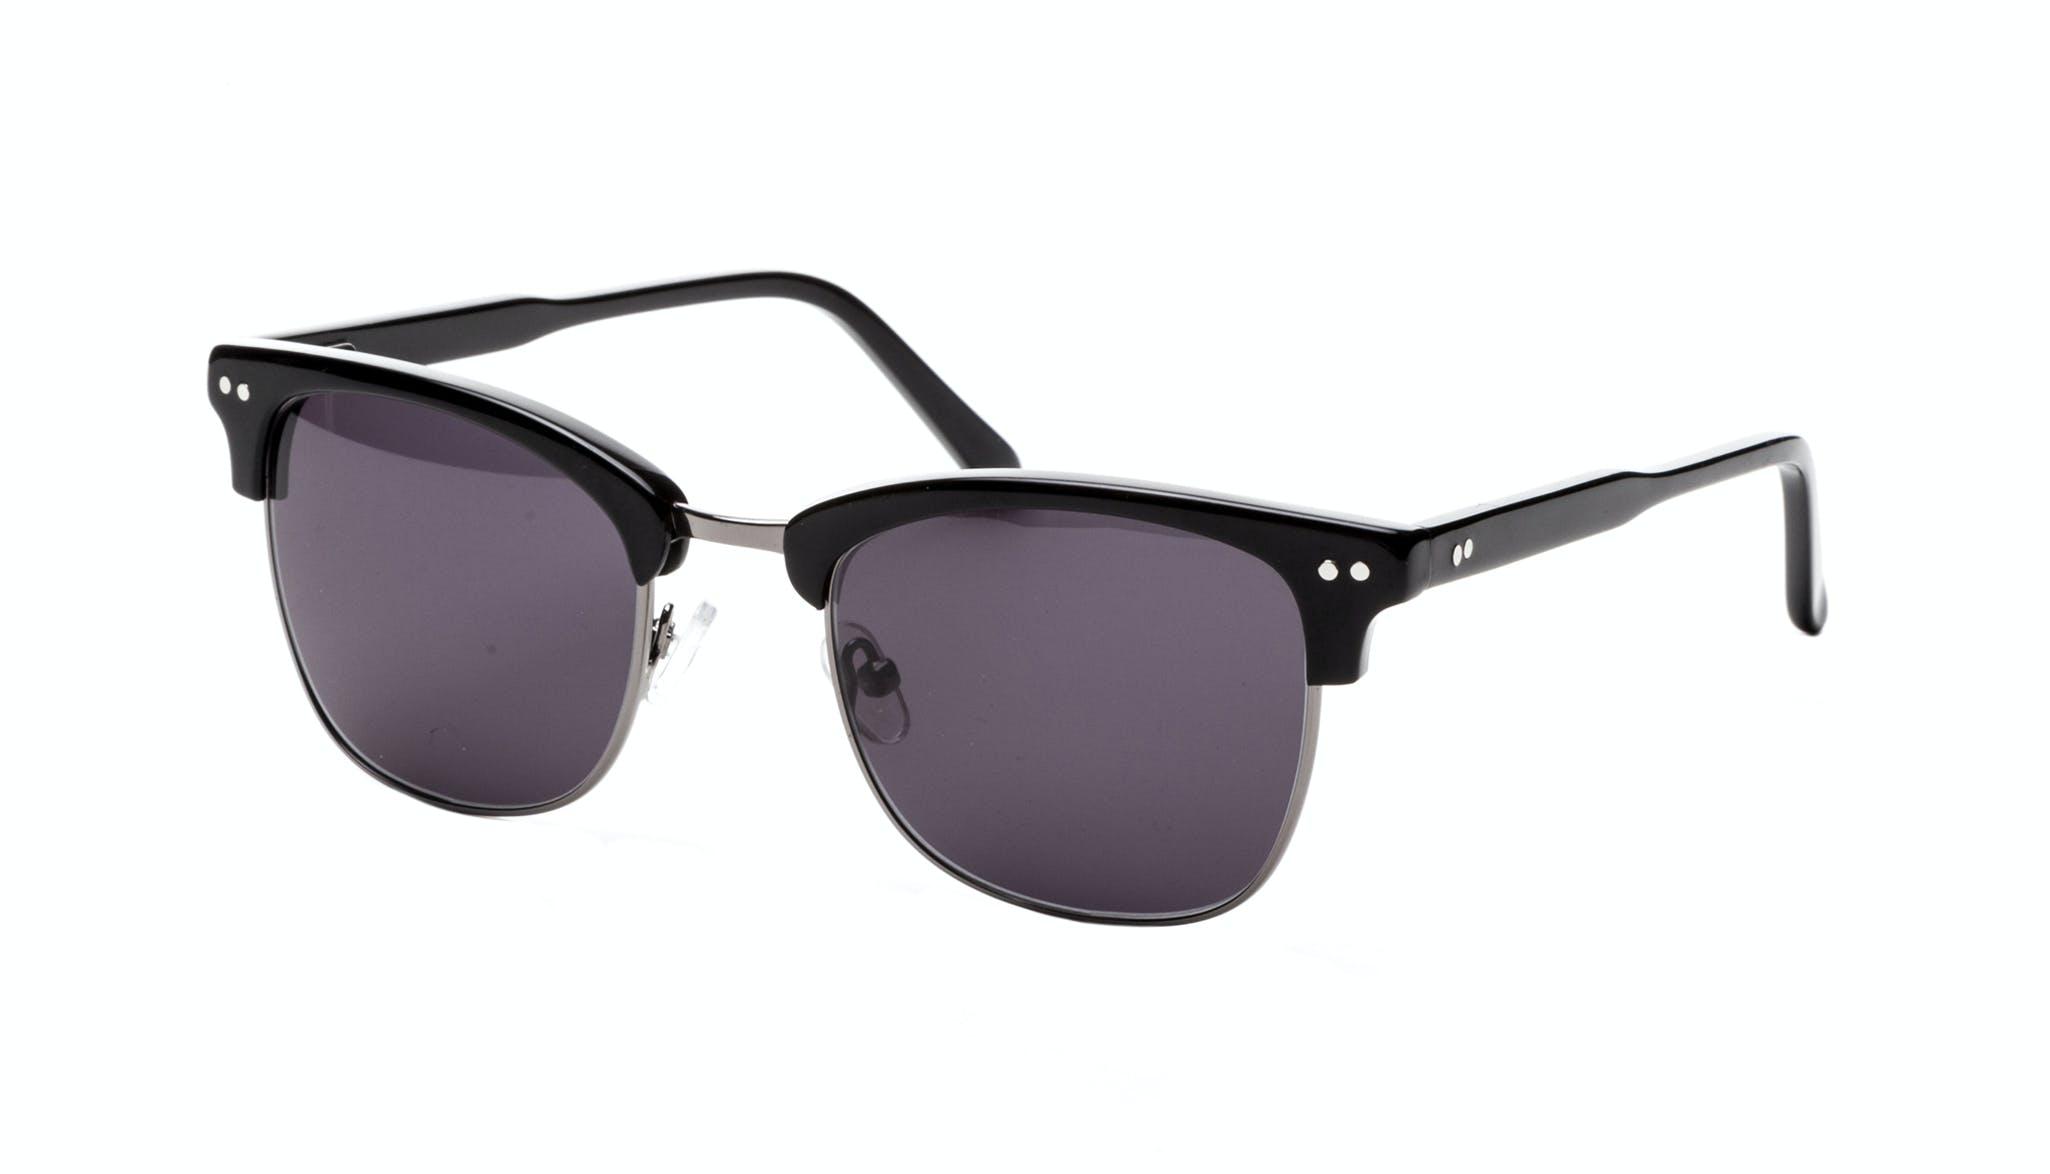 Affordable Fashion Glasses Square Sunglasses Men Lift Onyx Tilt